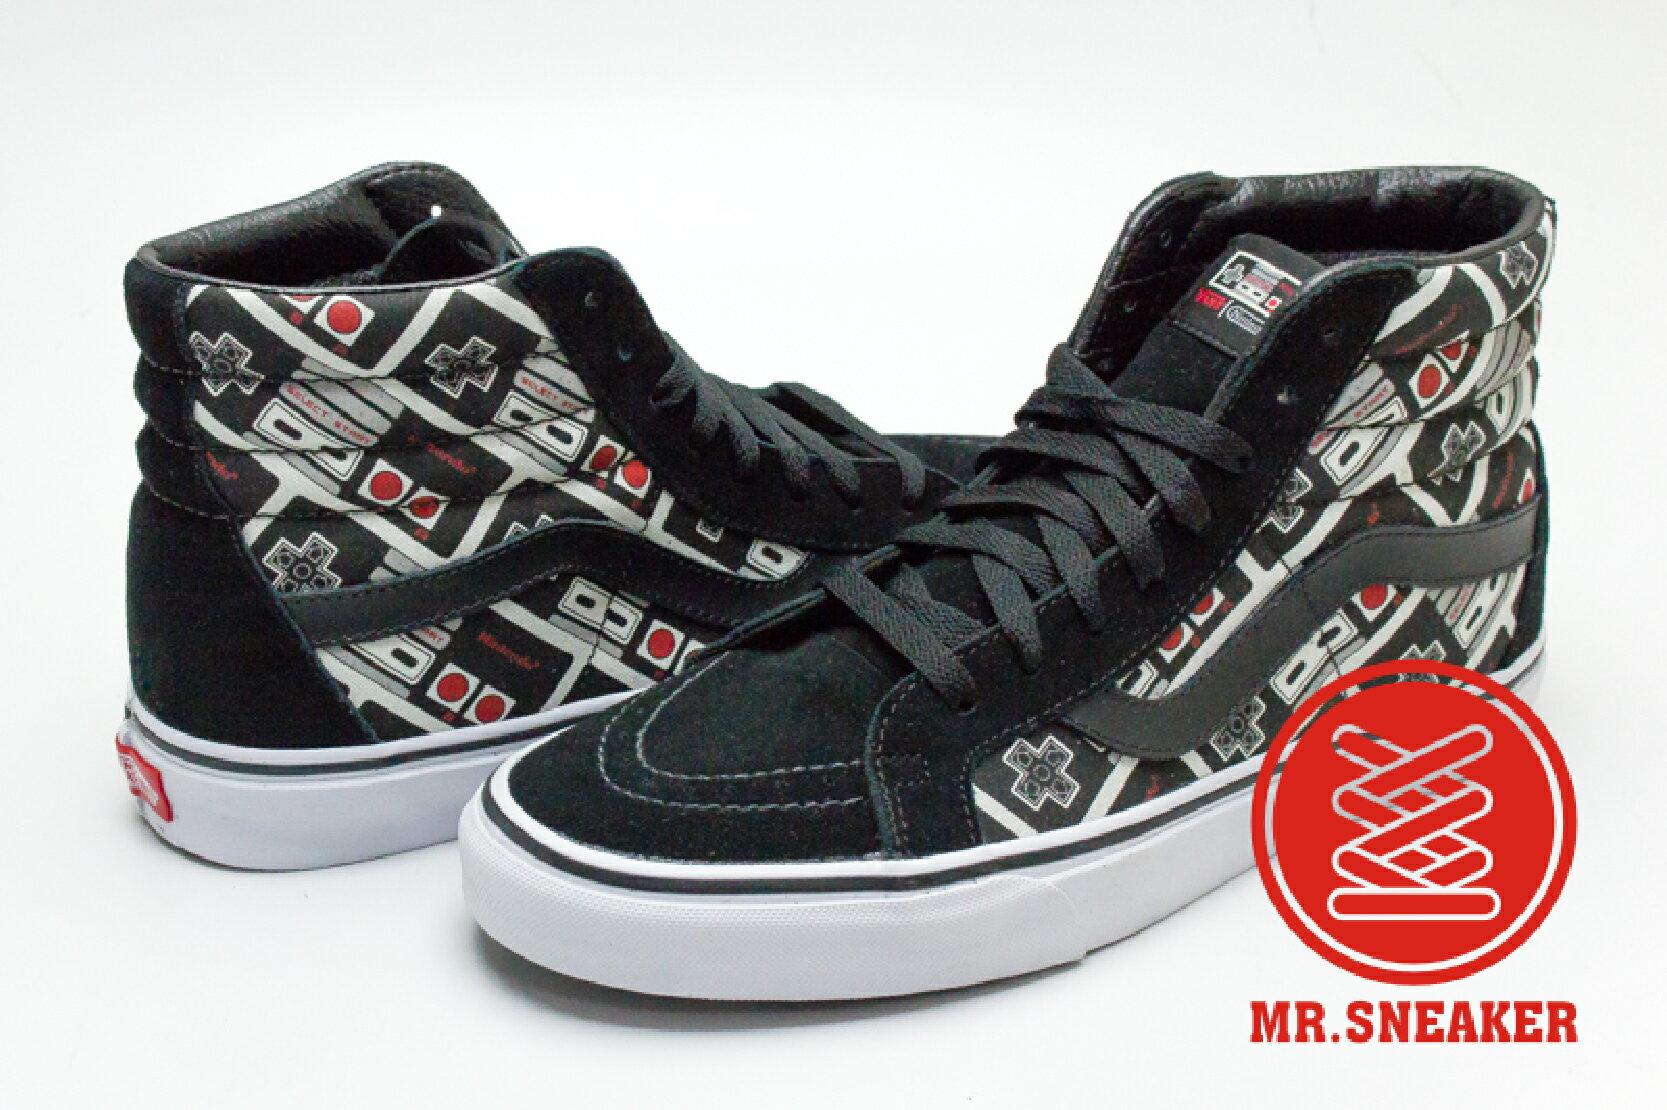 ☆Mr.Sneaker☆ VANS X Nintendo SK8-HI 高筒 紅白機 搖桿 限量 聯名 黑色 男女款